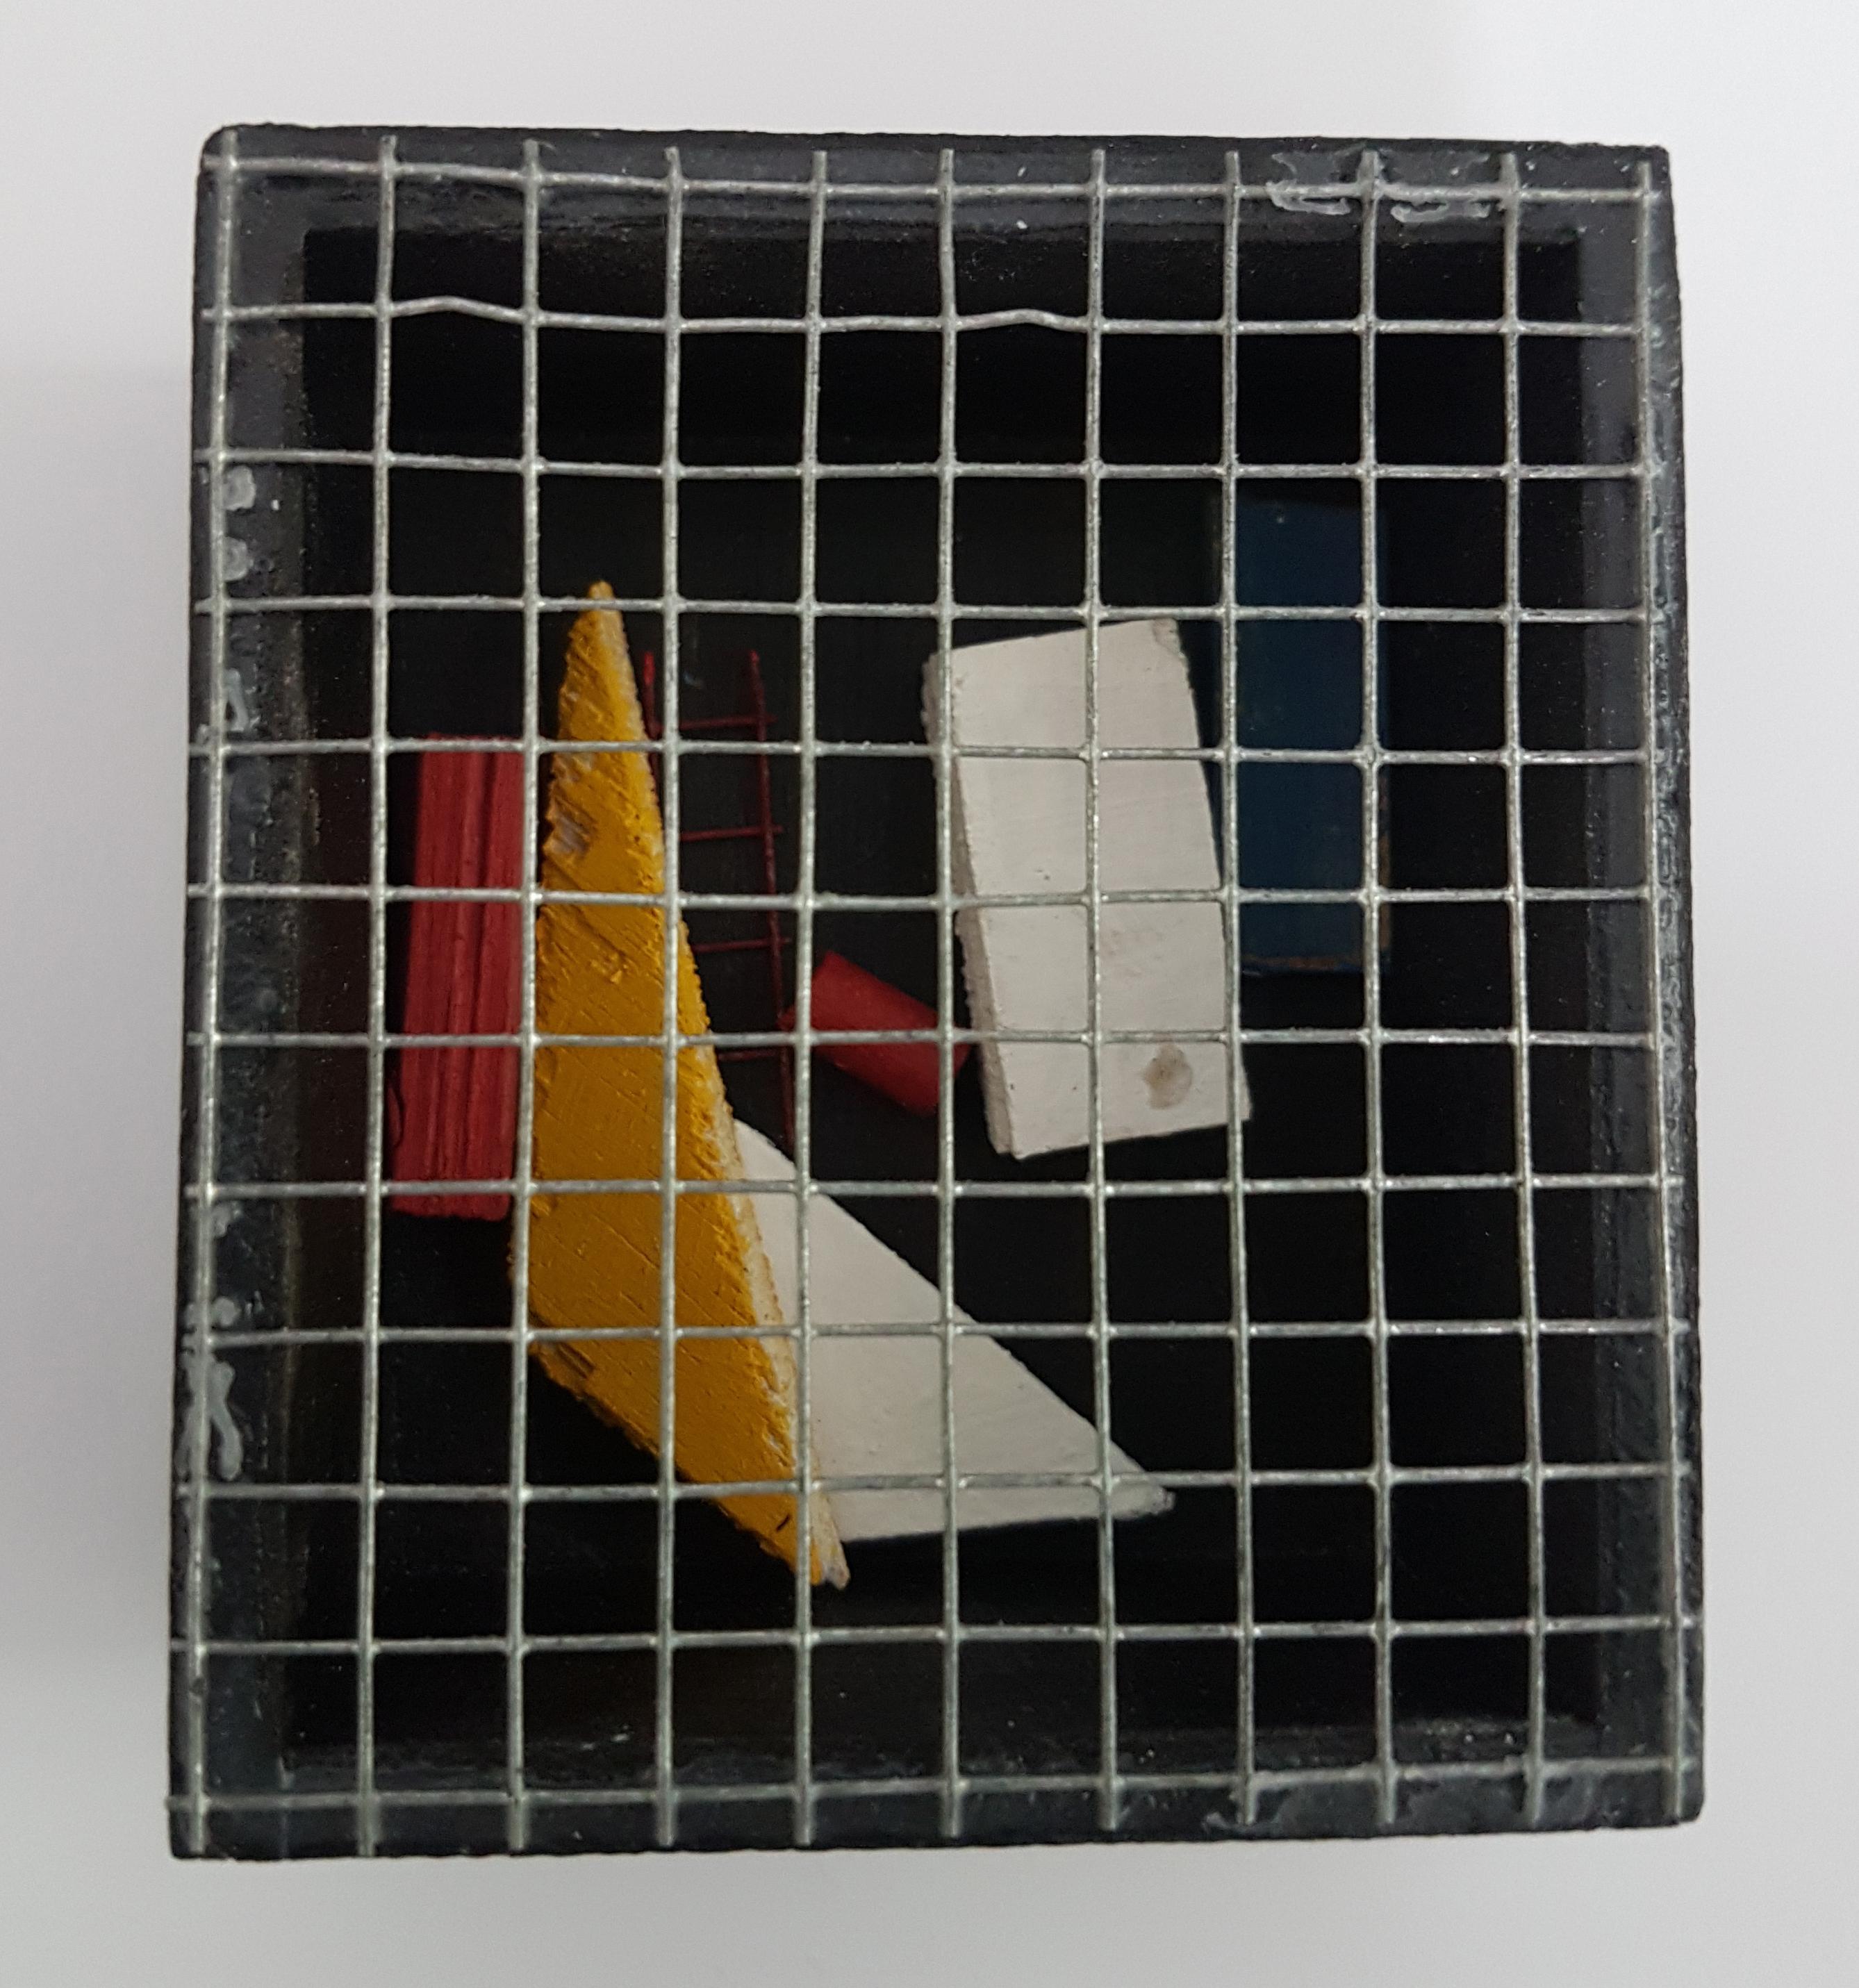 Arthur Luiz Piza, T - 1436-Arame galvanizado e madeira pintada, 3,5x6,5x7,5 cm